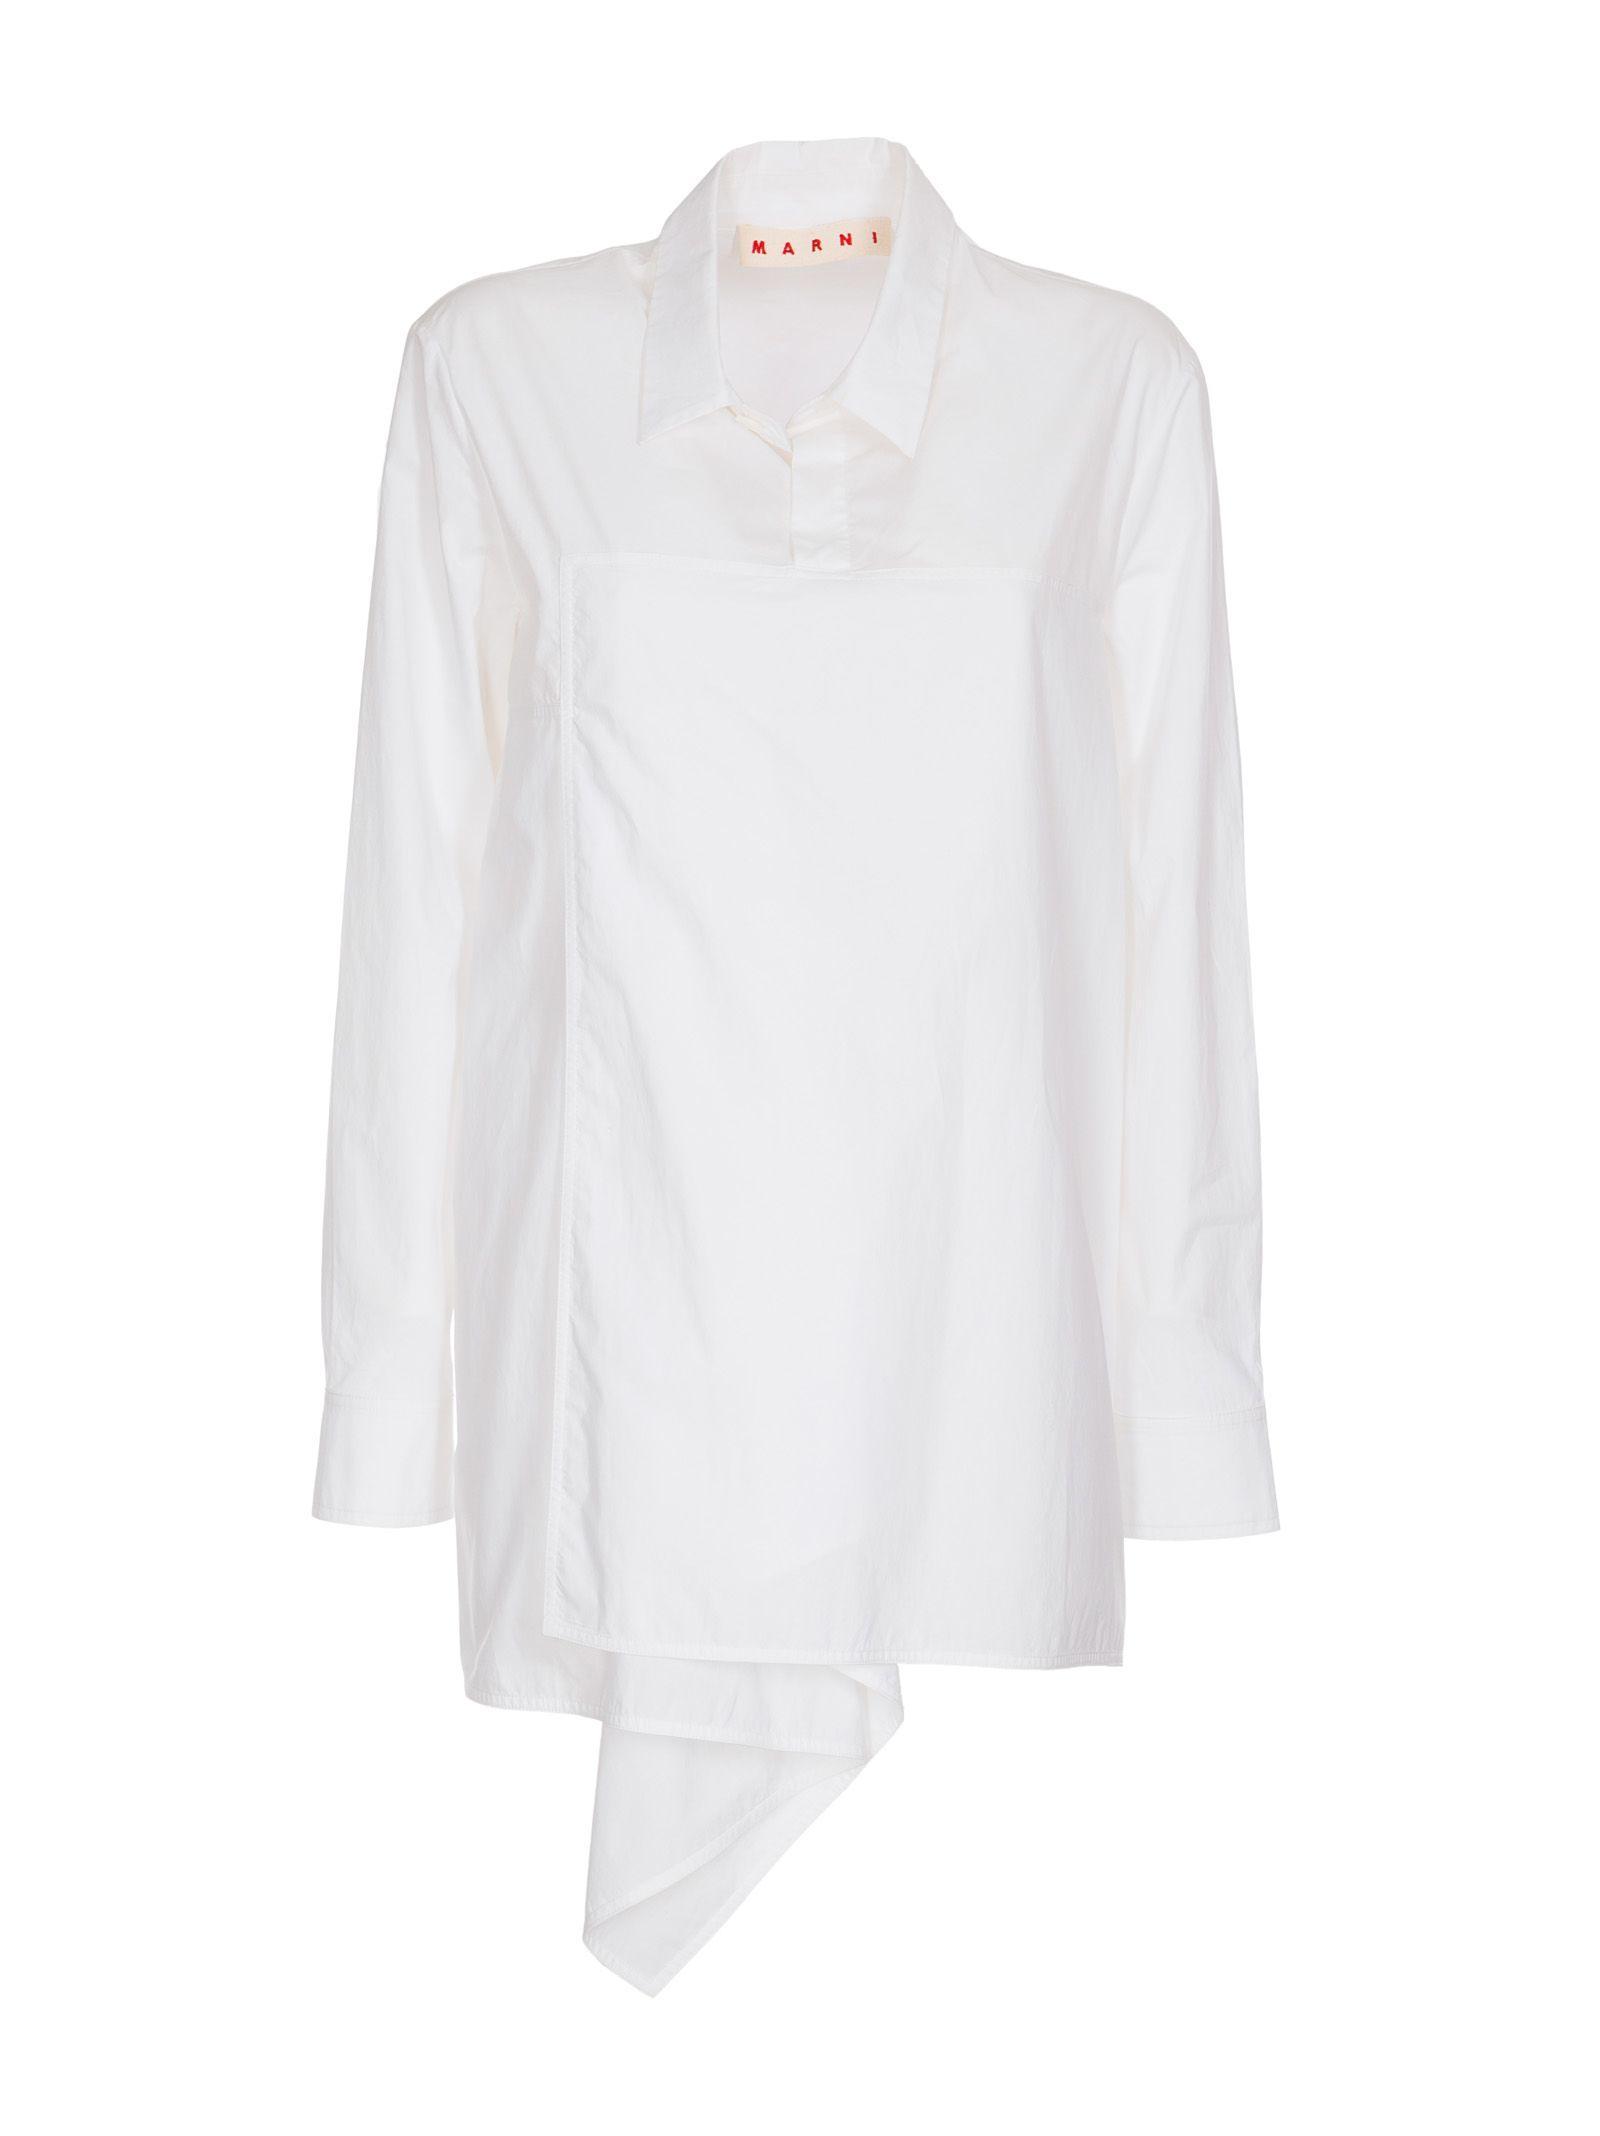 Marni Classic Shirt In White